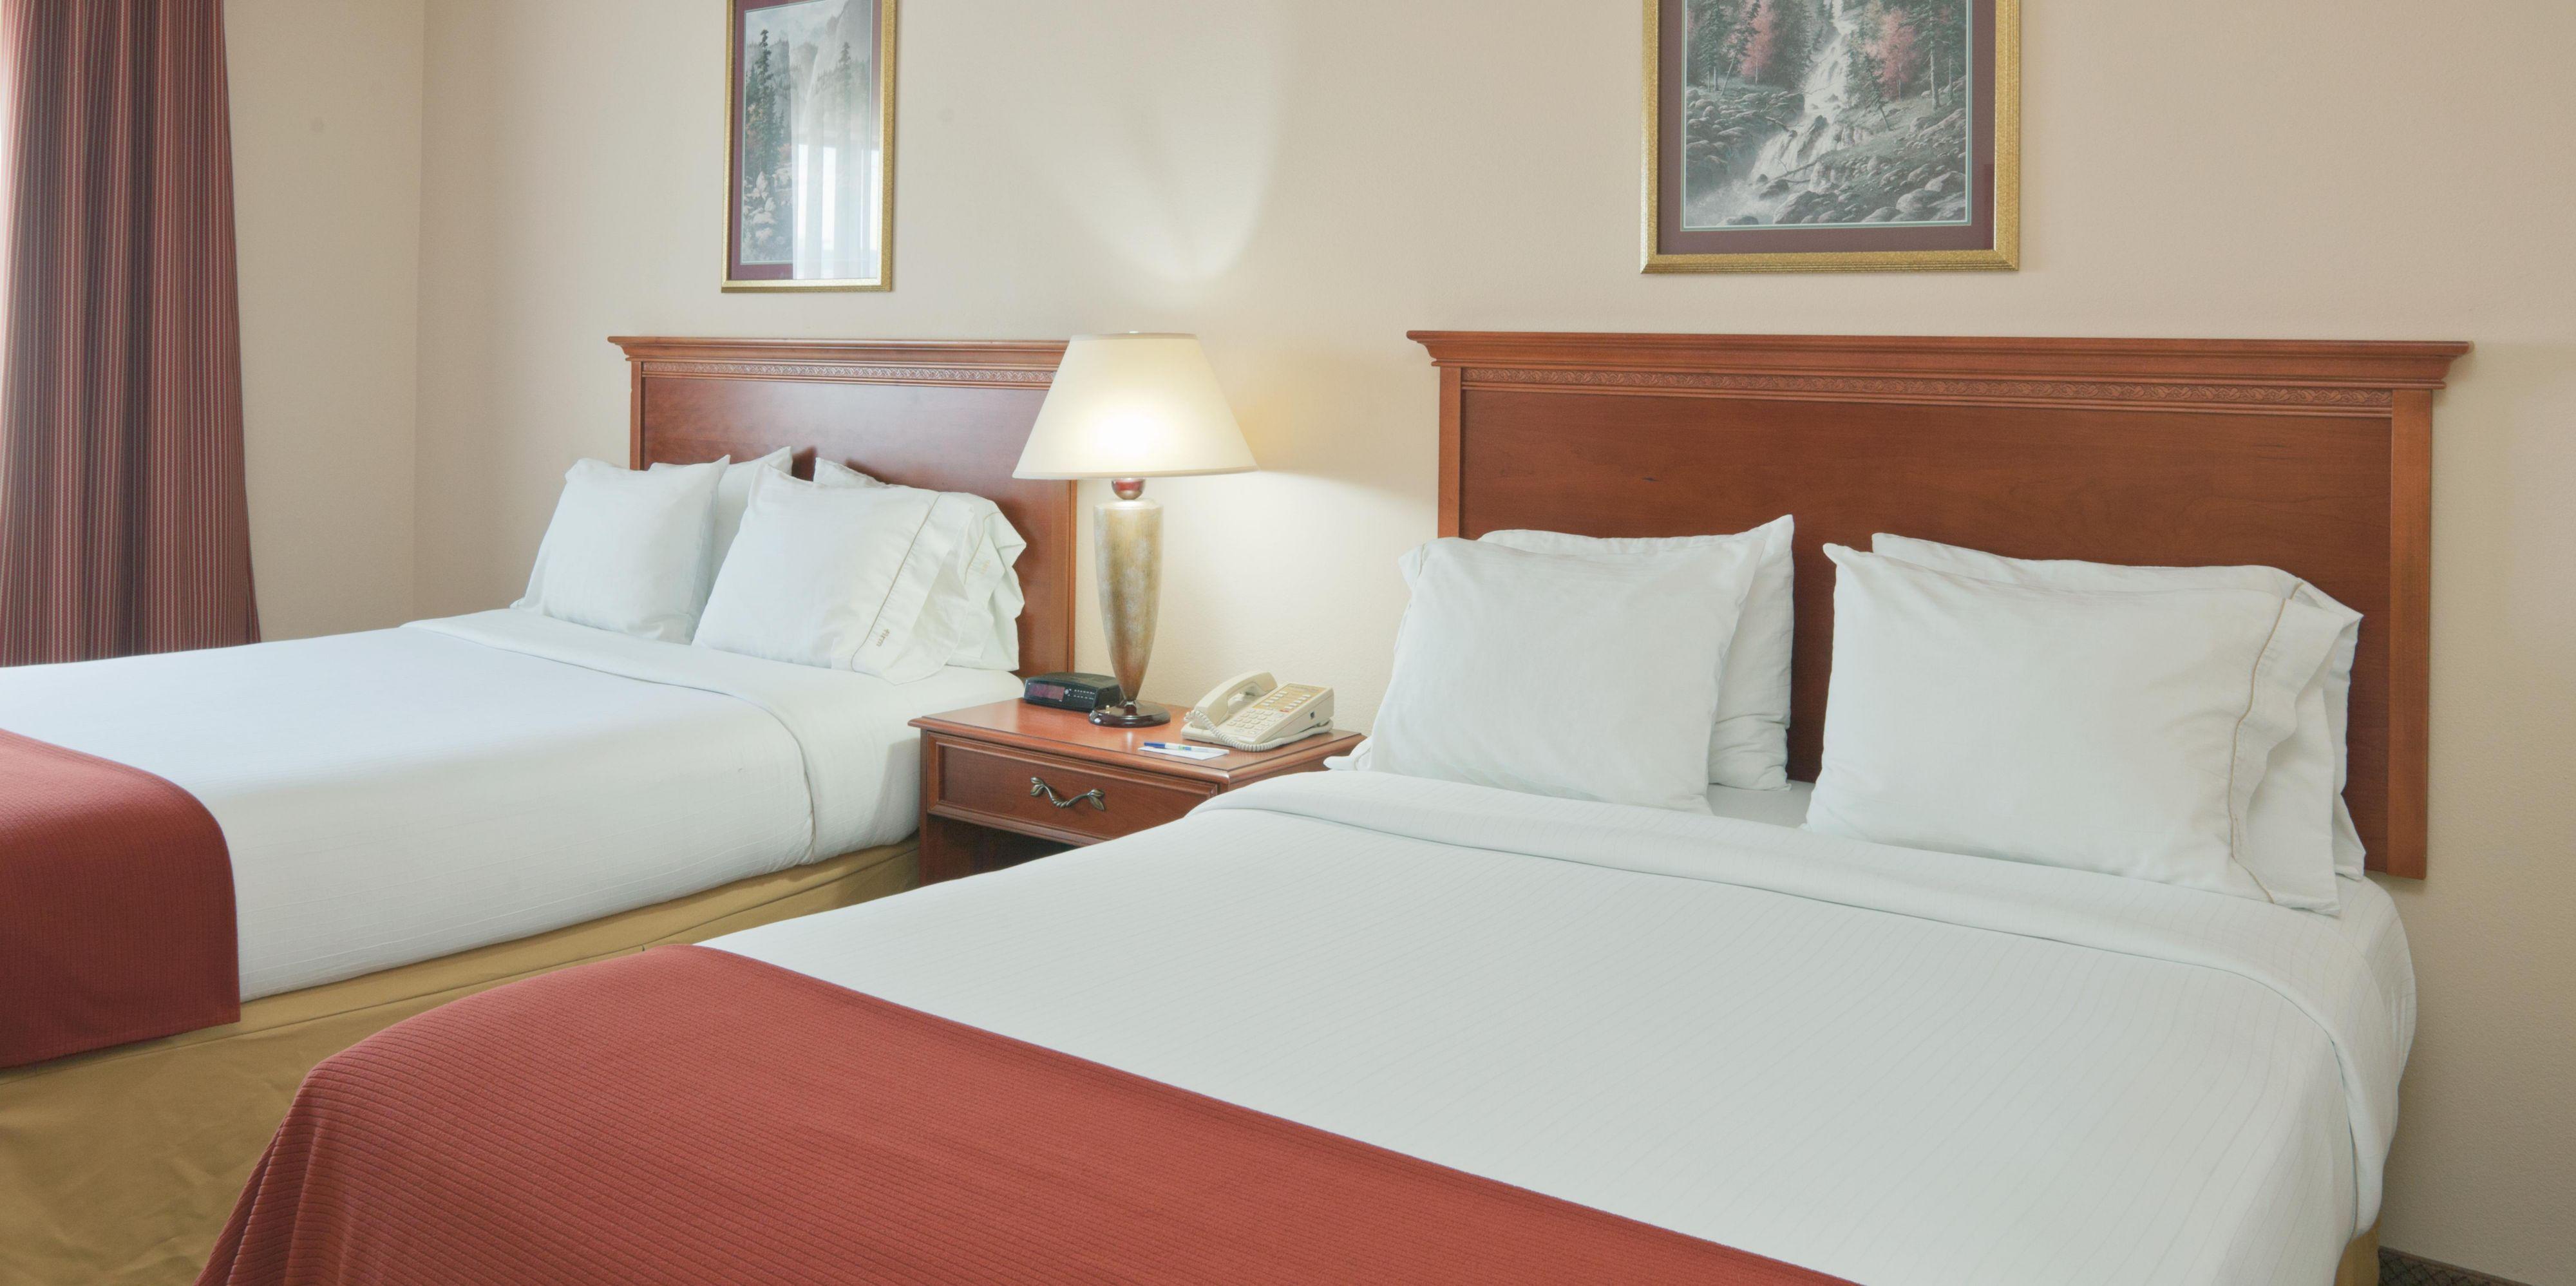 Holiday Inn Express Portage Hotel by IHG